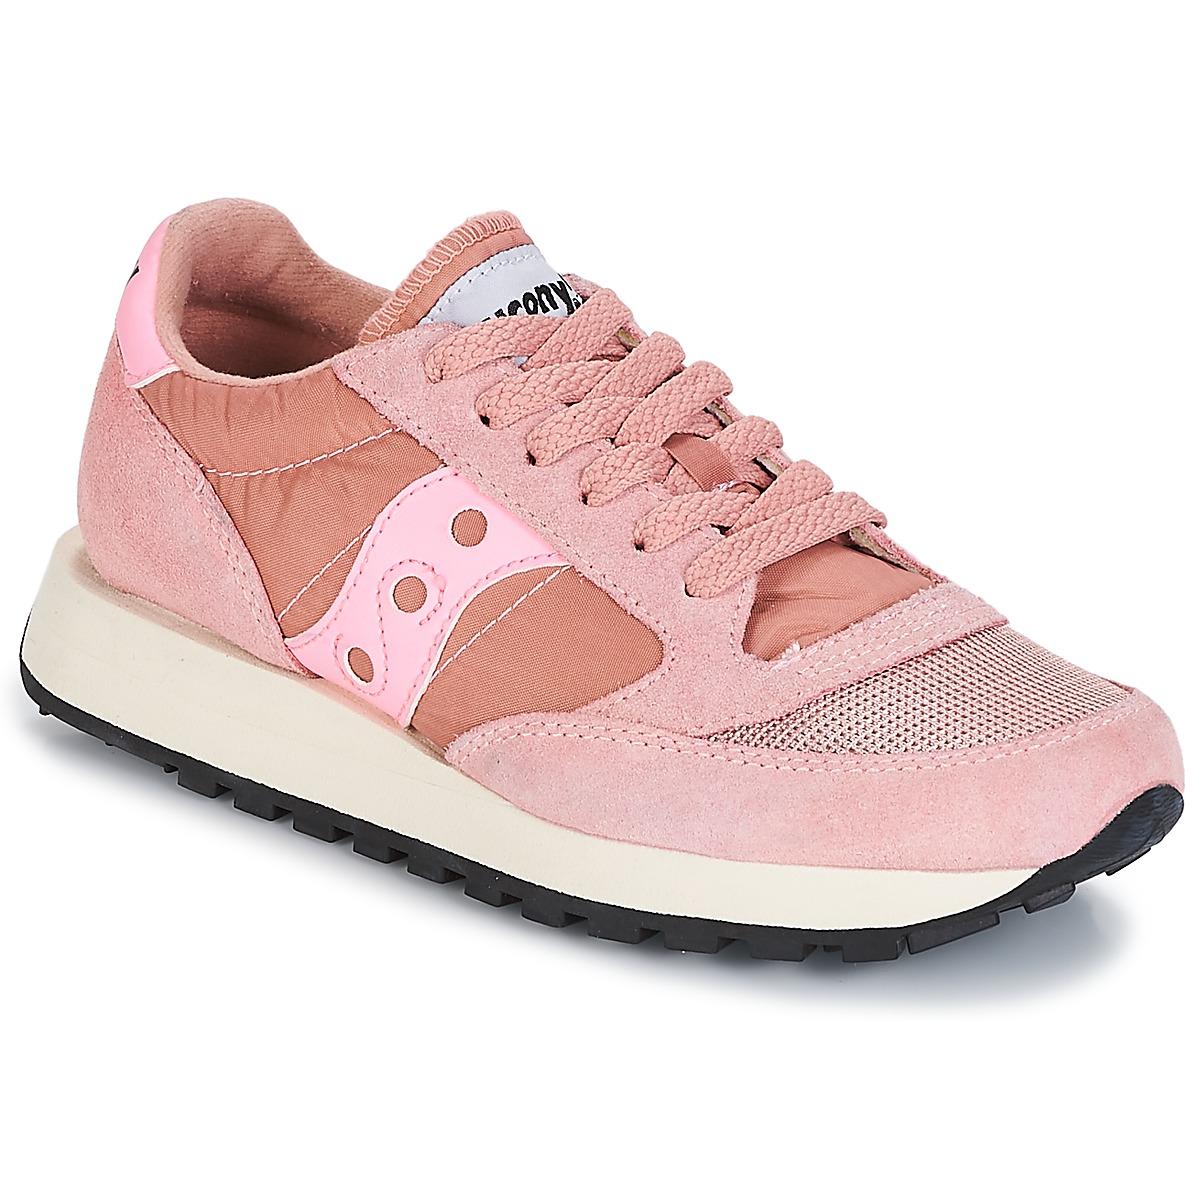 Saucony Xαμηλά Sneakers JAZZ ORIGINAL VINTAGE - Glami.gr 2fd8035209a